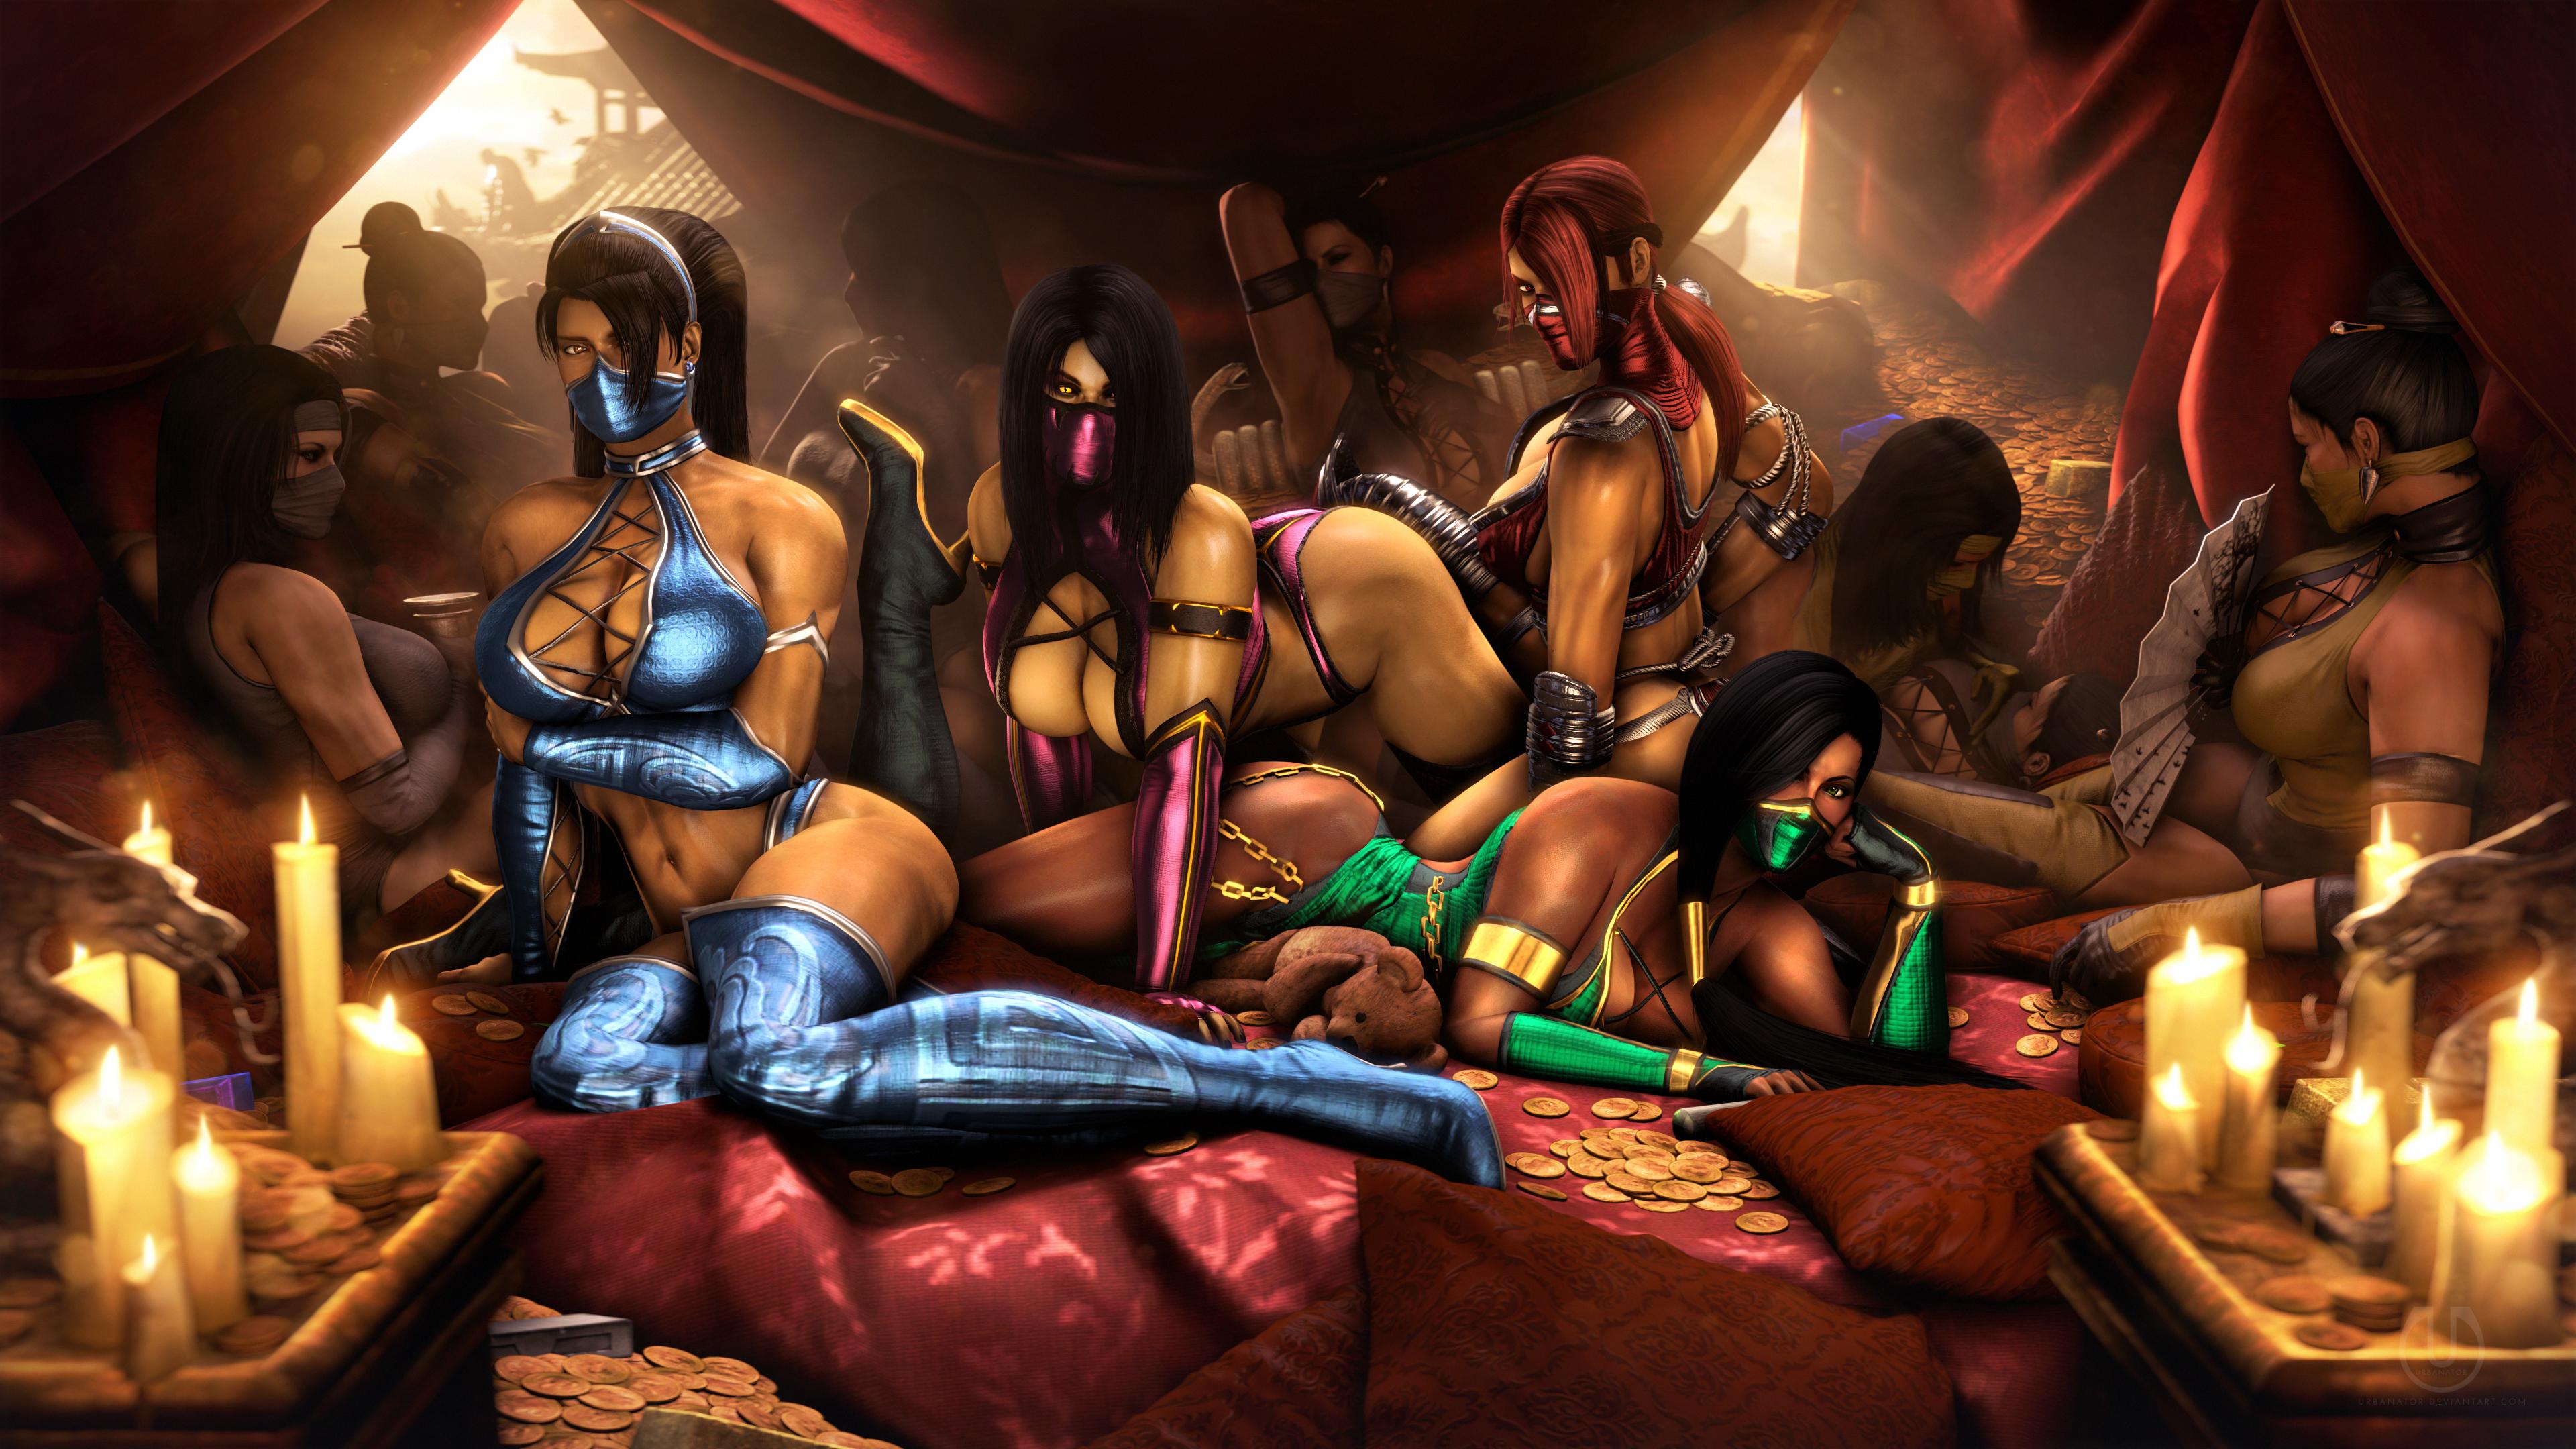 Femme Fatality | Mortal Kombat